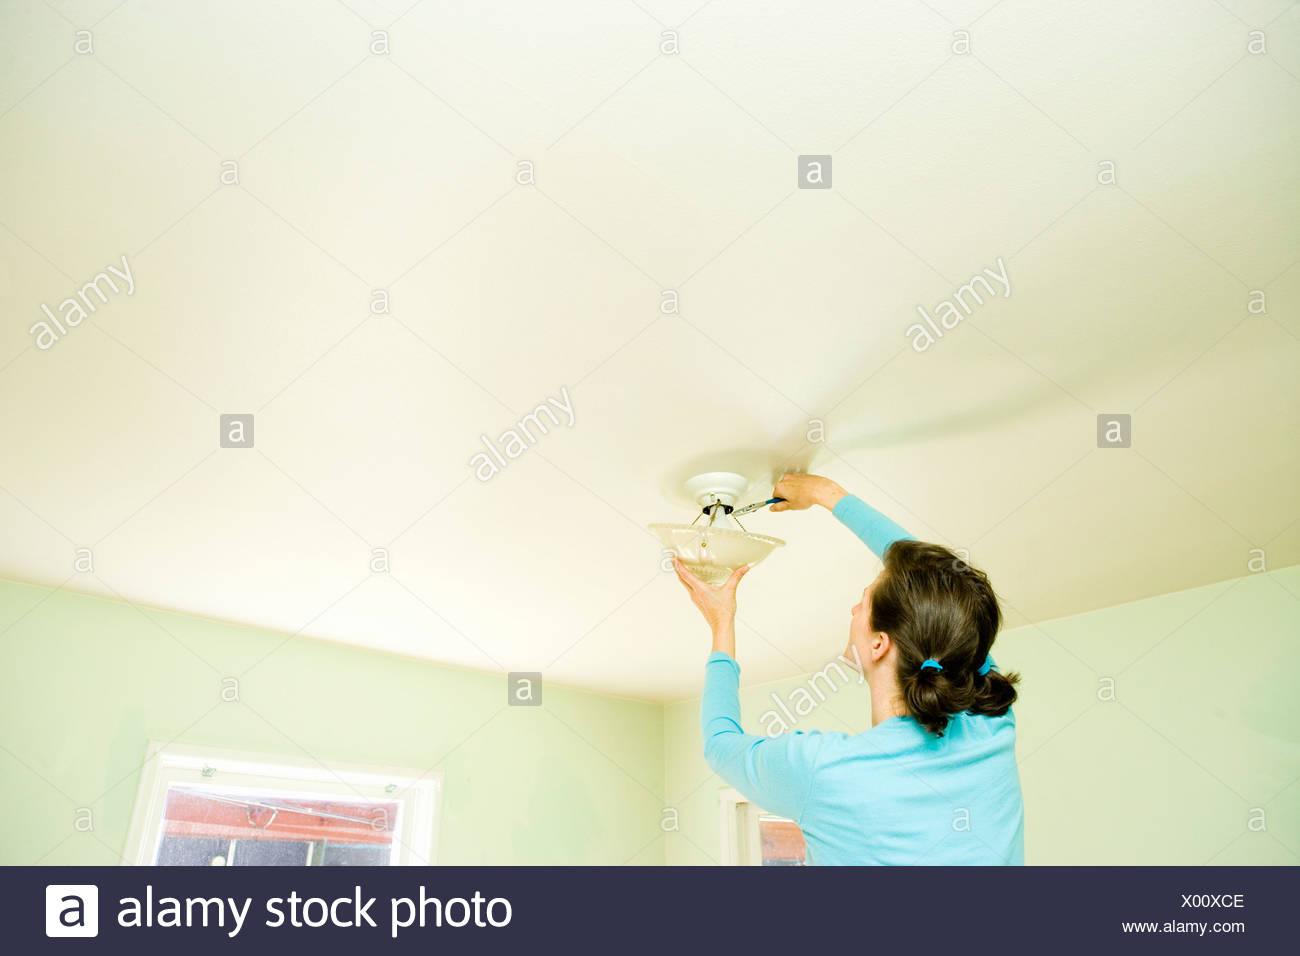 Woman Repairing Light Fixture On Ceiling